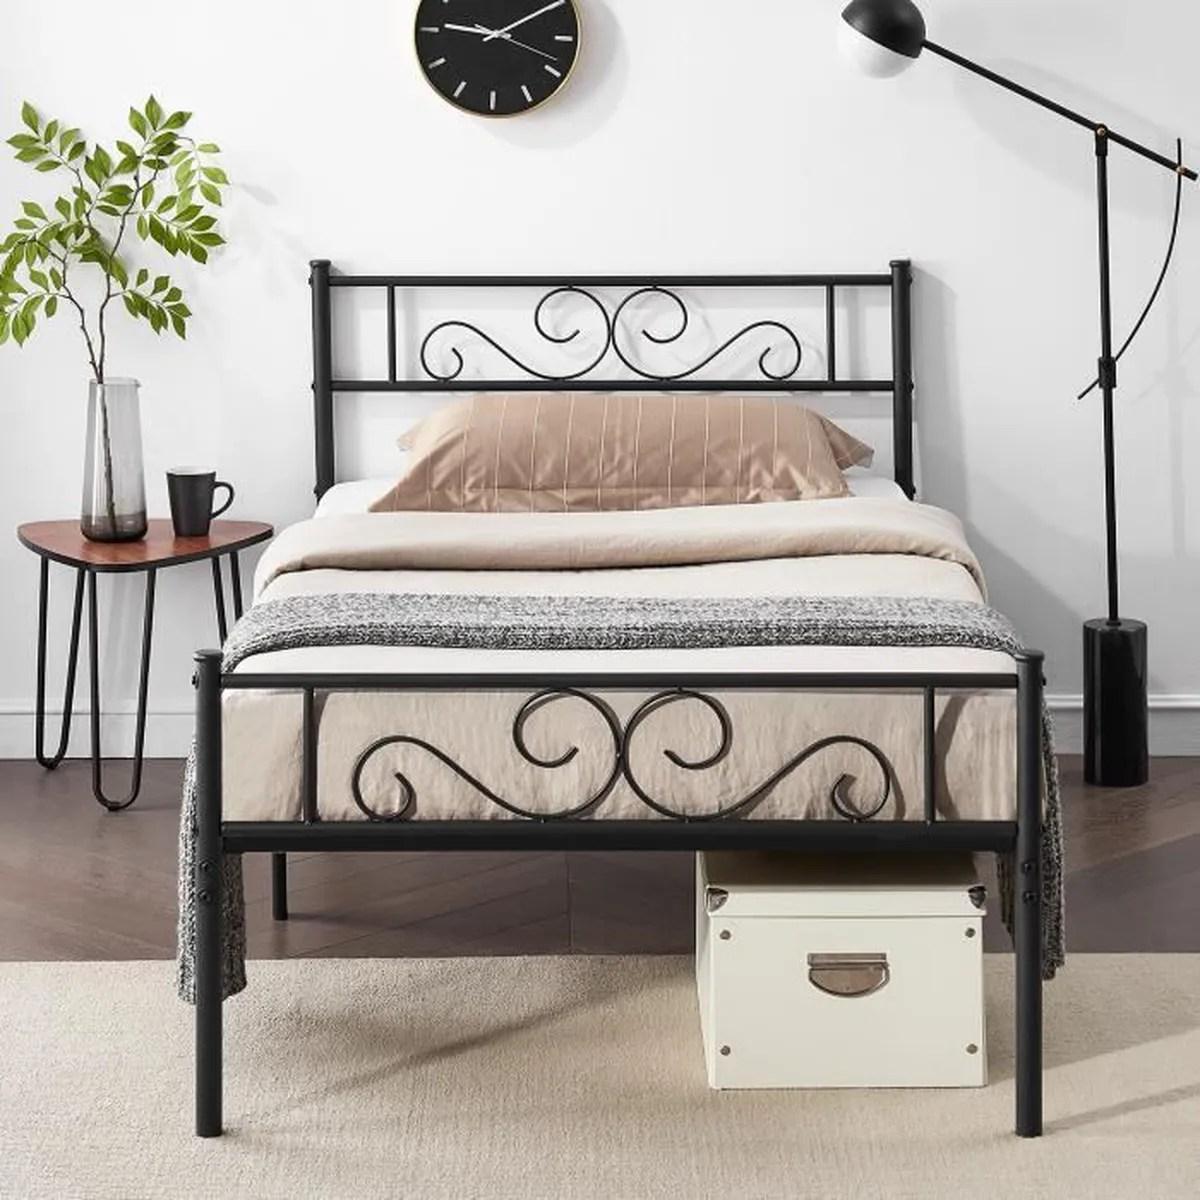 vecelo lit en metal 90 x 190 cm pour